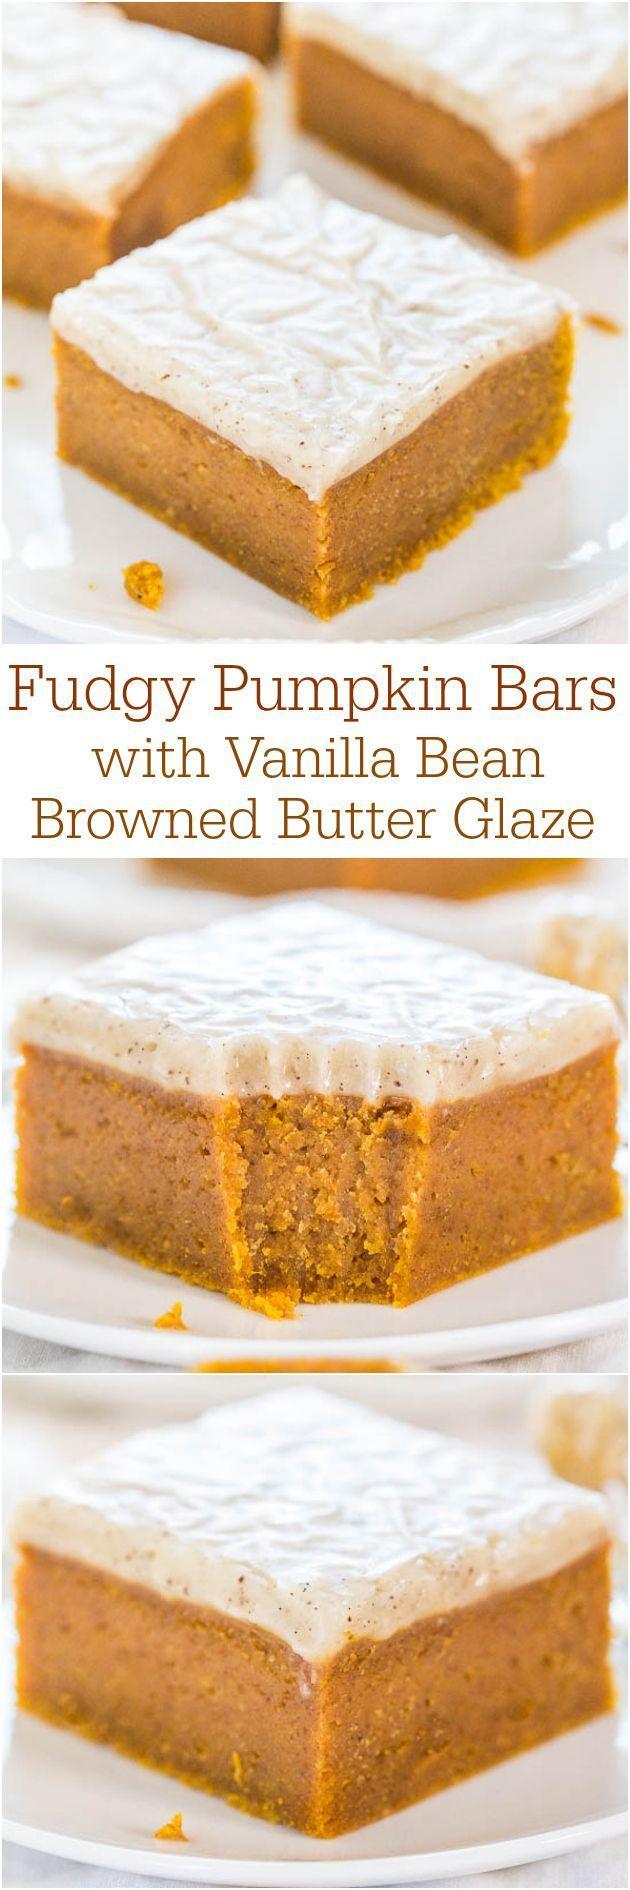 Fudgy Pumpkin Bars with Vanilla Bean Browned Butter Glaze | CookJino